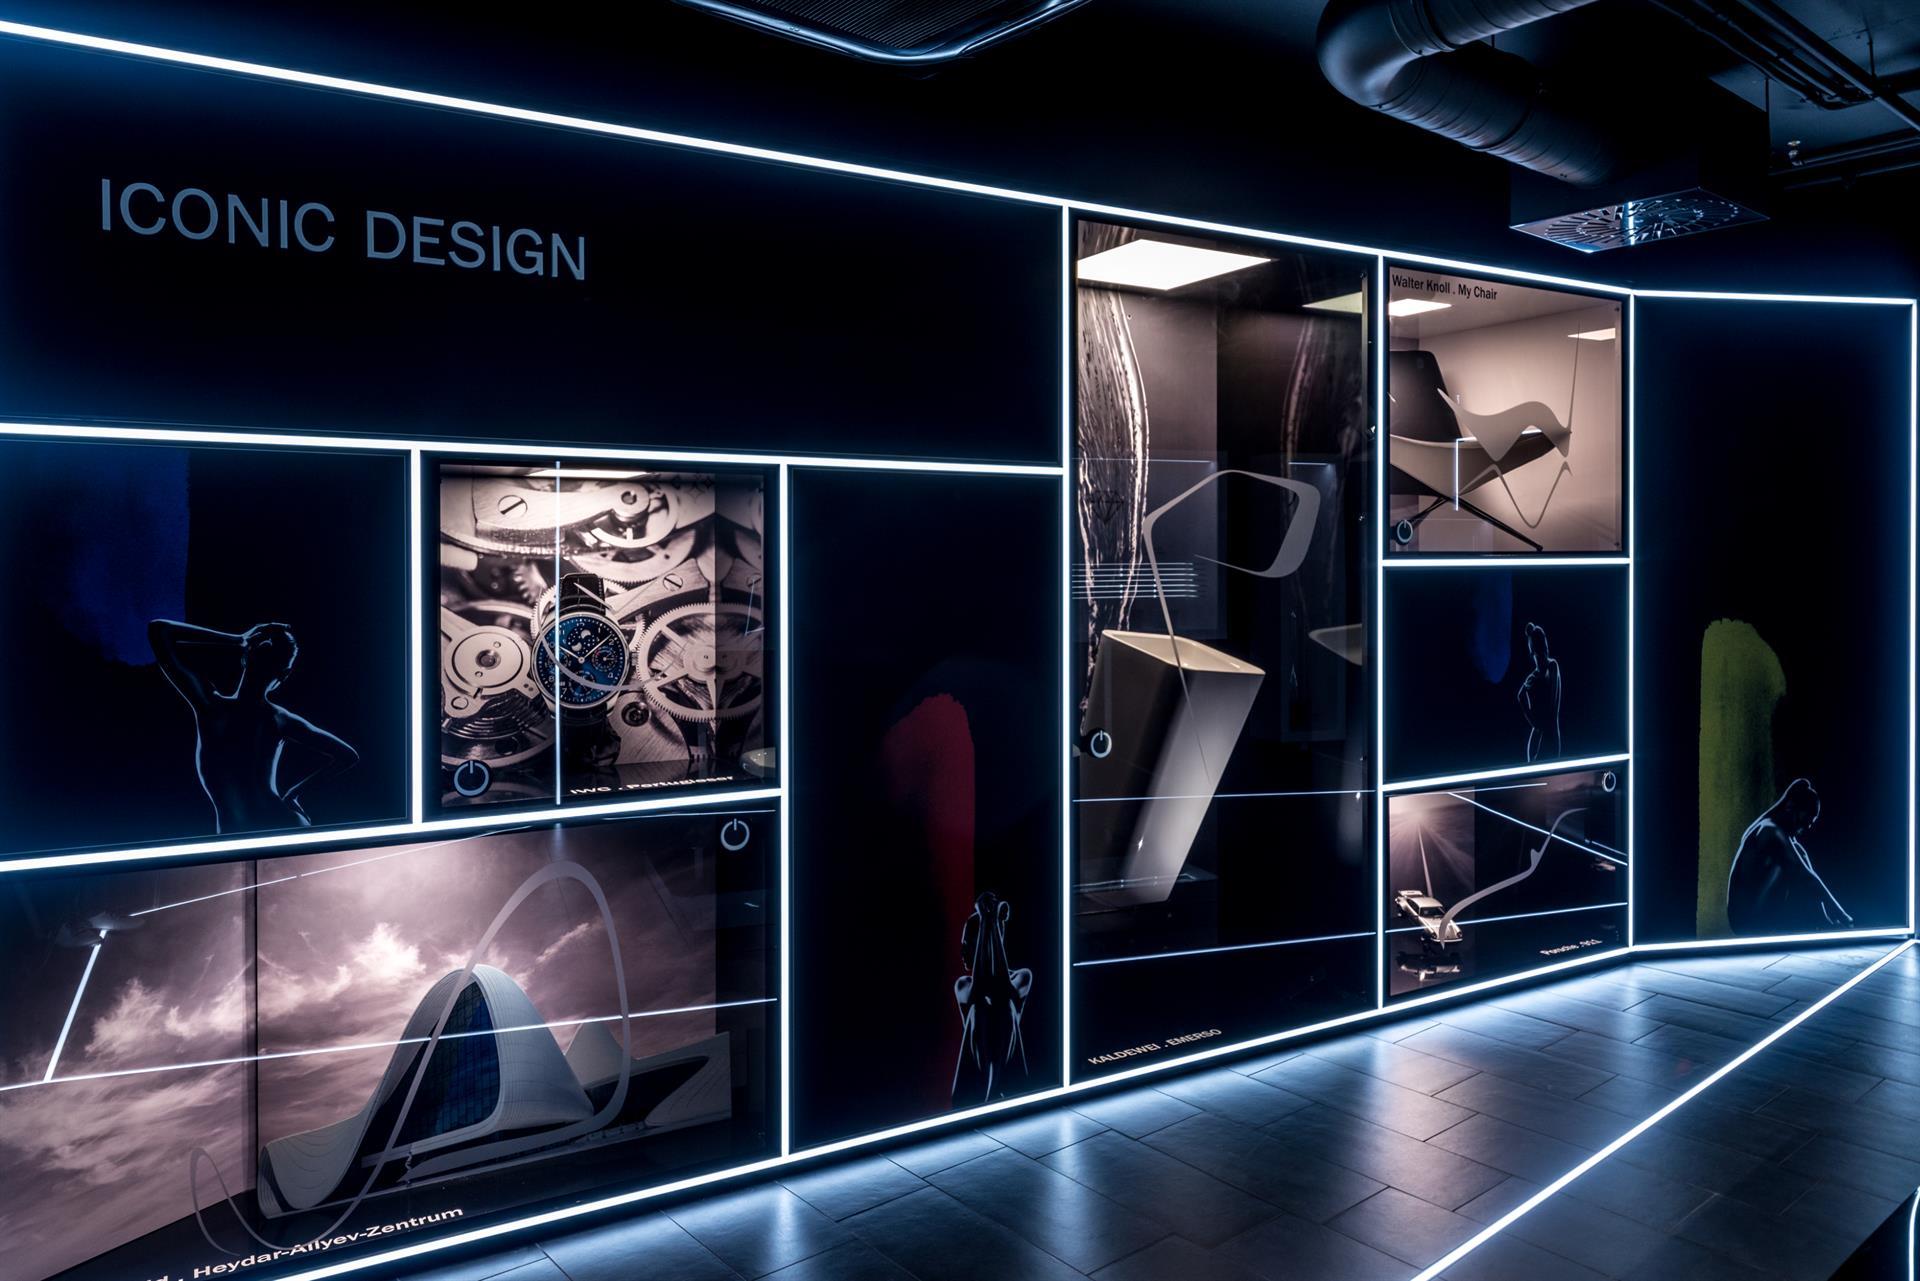 3_Kaldewei_Iconic_Design(0)